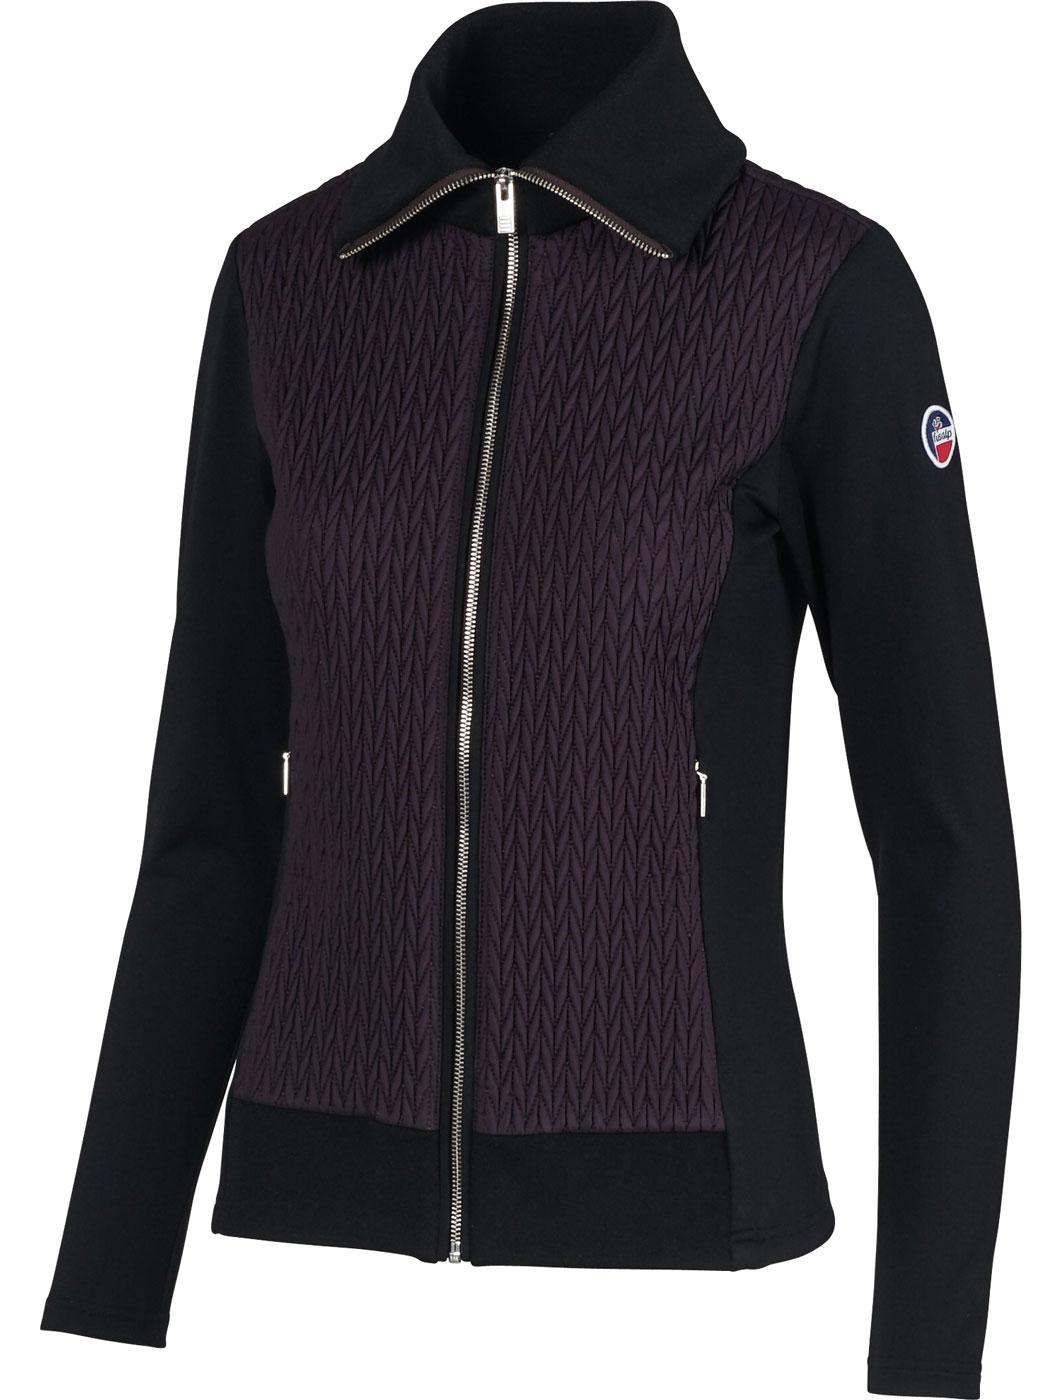 dad213102207 Fusalp Chesery - Ski Jackets - buy online at Sport Gardena